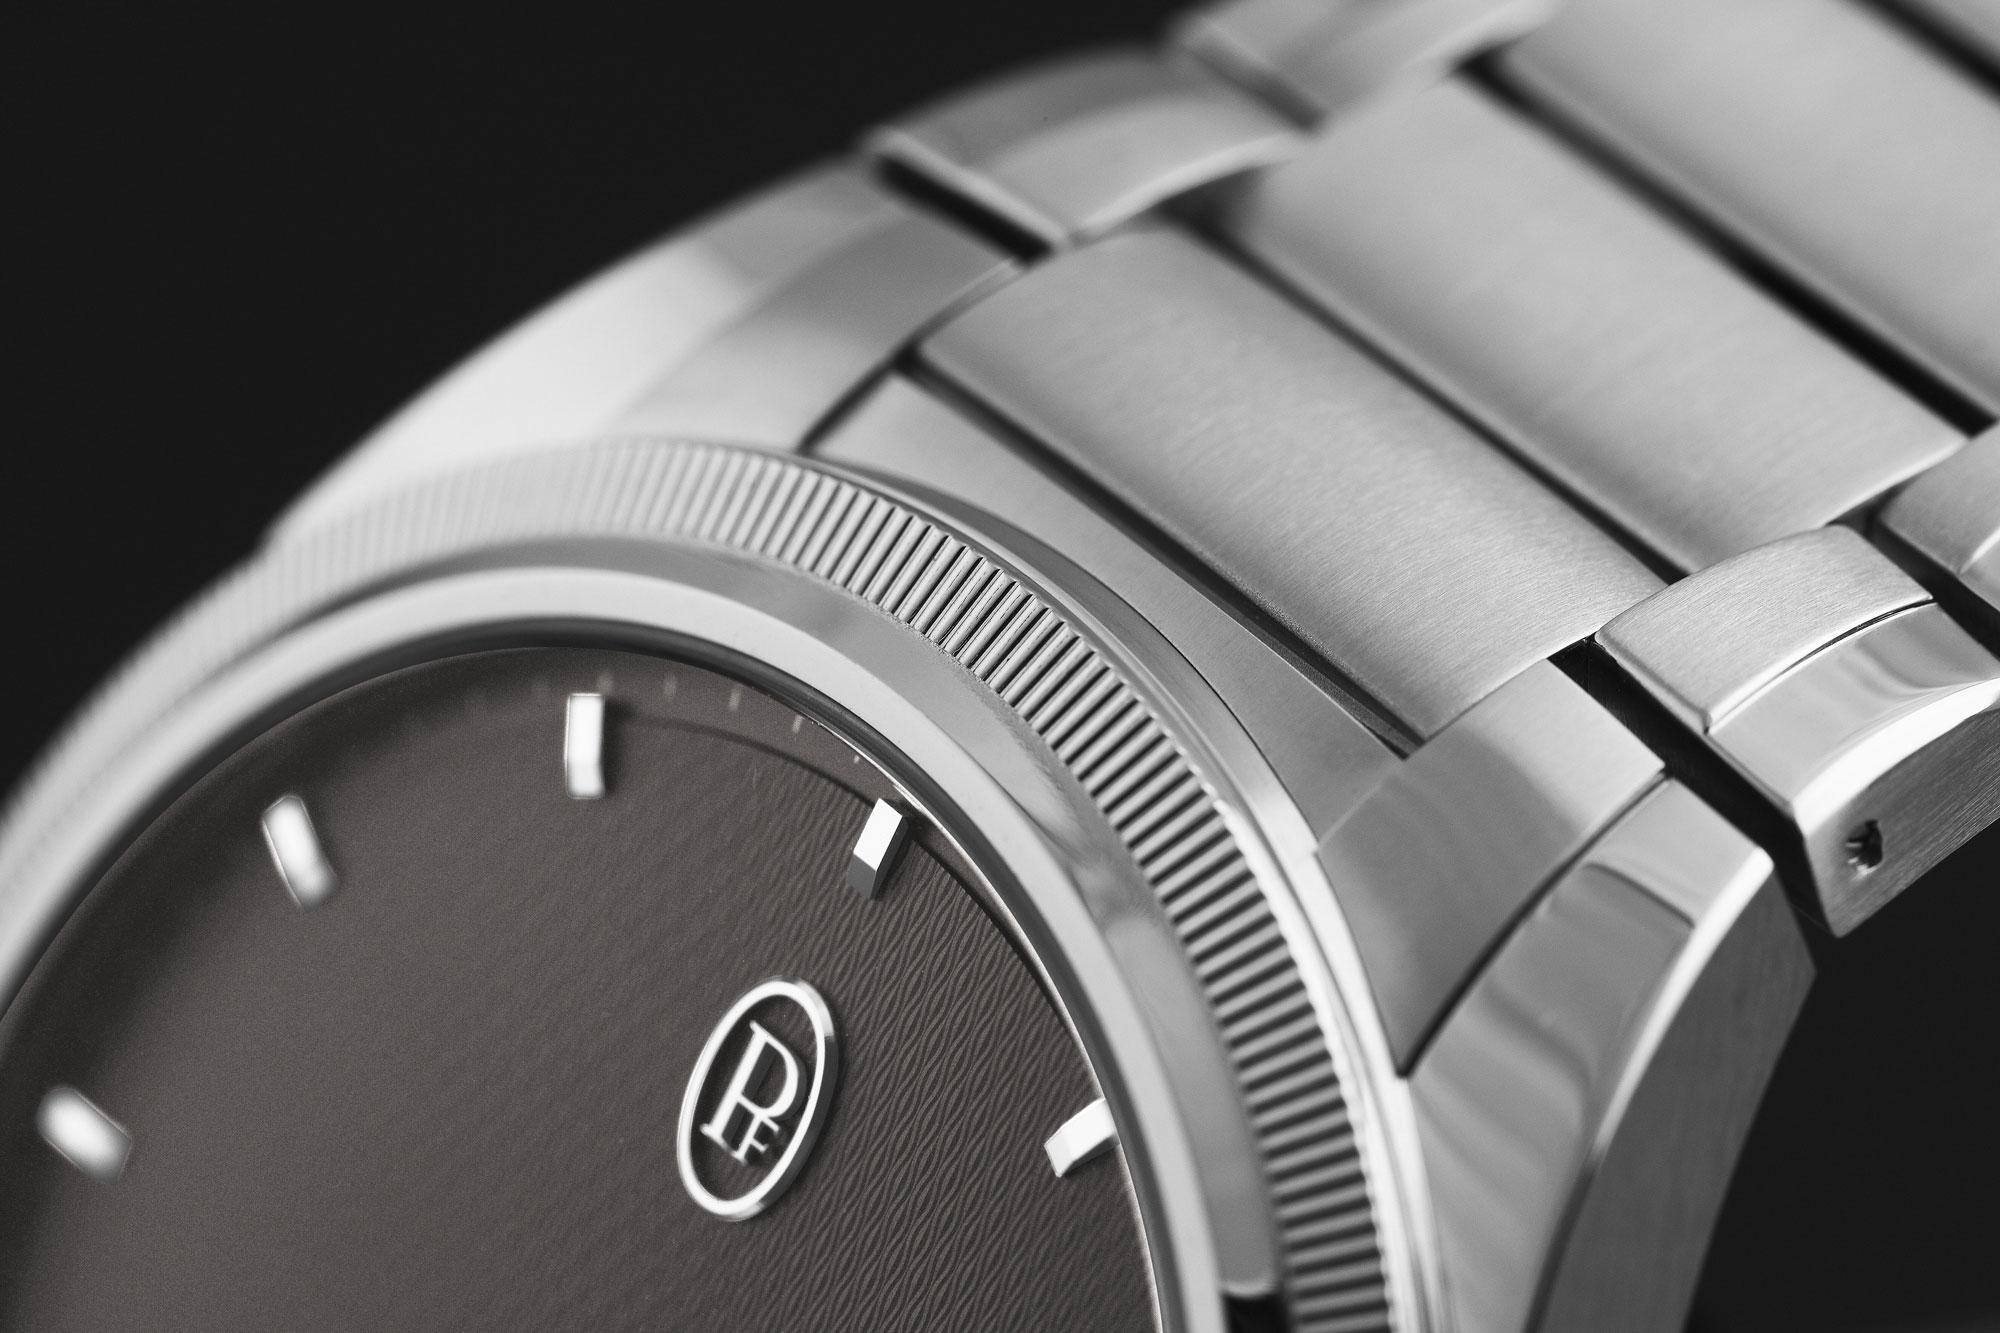 Parmigiani Fleurier Tonda PF Micro-Rotor – Ref. PFC914-2020001-200182